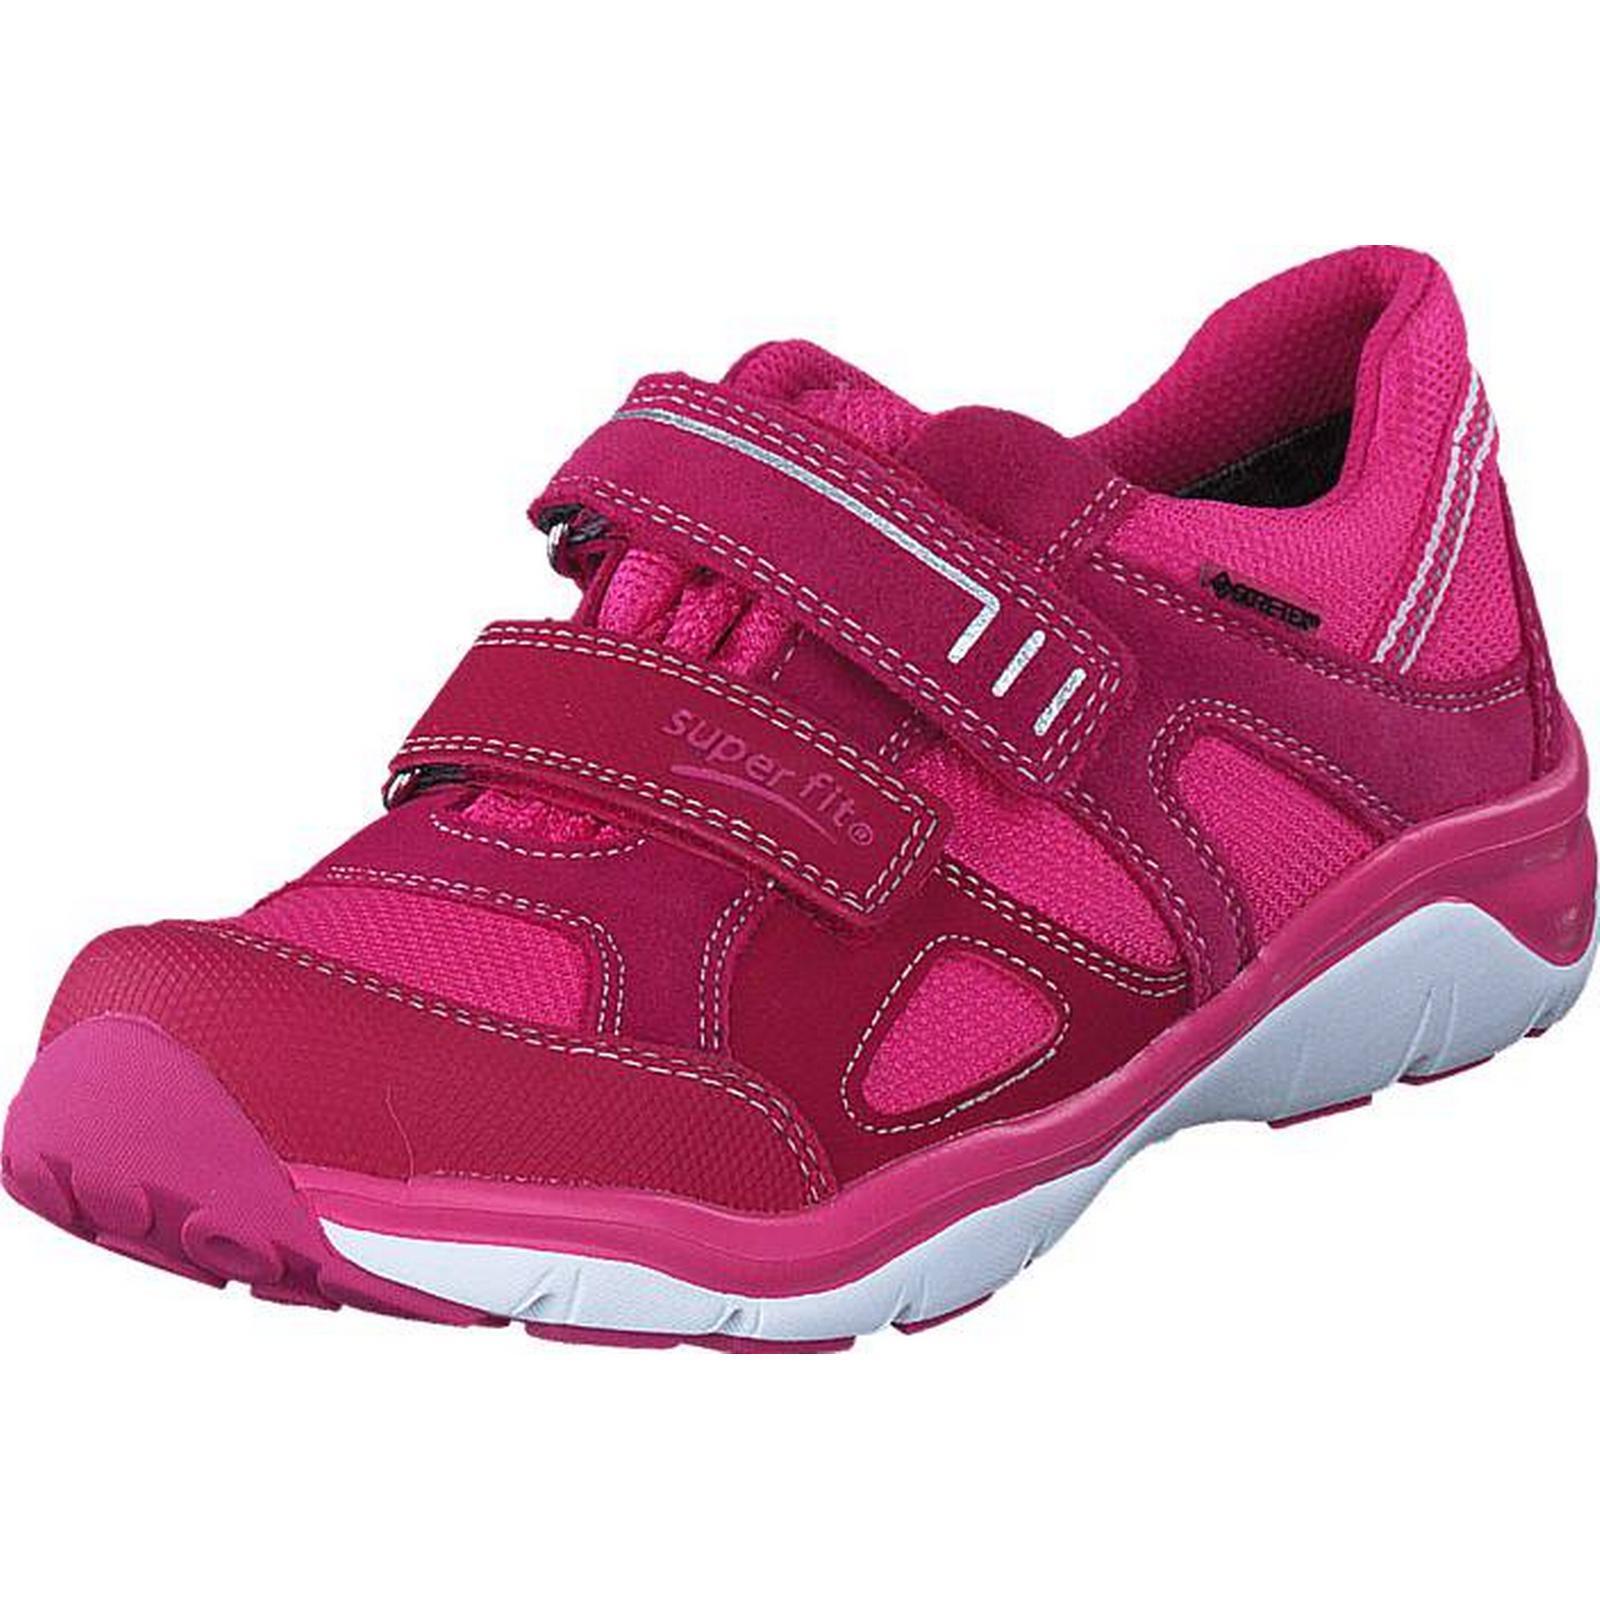 Superfit Sport5 GORE-TEX® Masala Kombi, Shoes, Shoes, Kombi, Trainers & Sport Shoes , Walking Shoes, Pink, Unisex, 25 1e3dc8